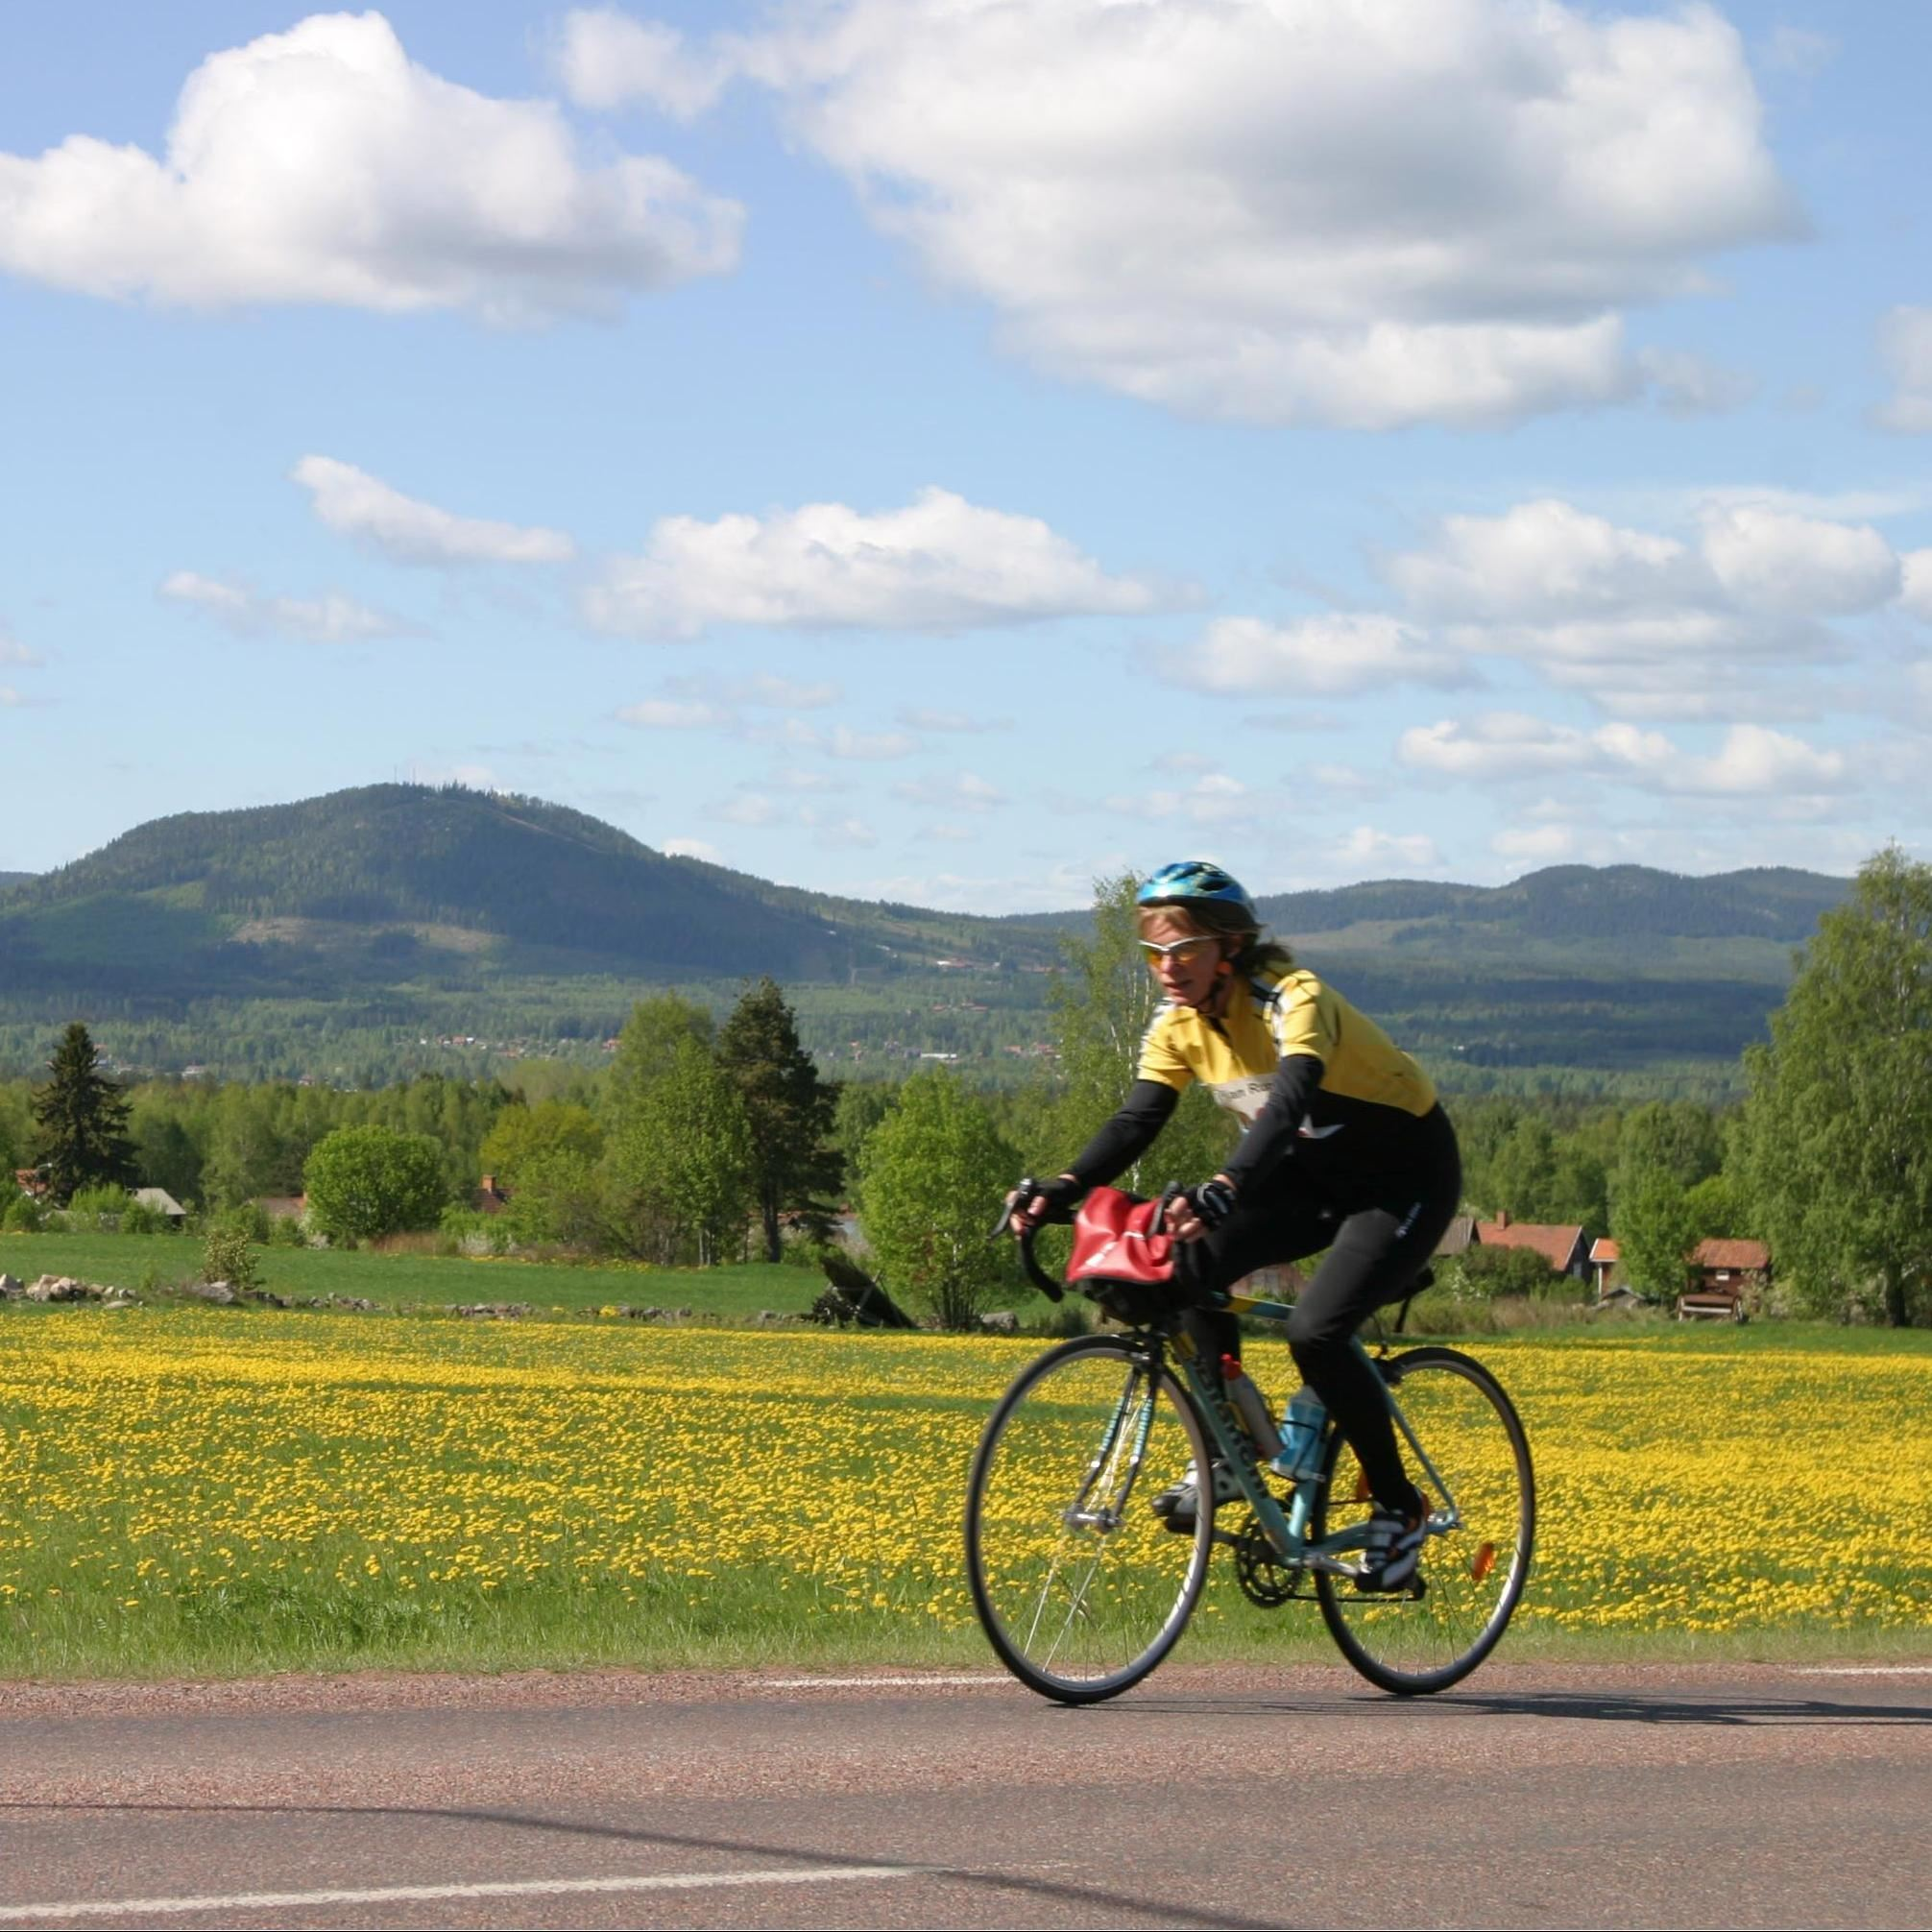 Siljansleden - Cykelled